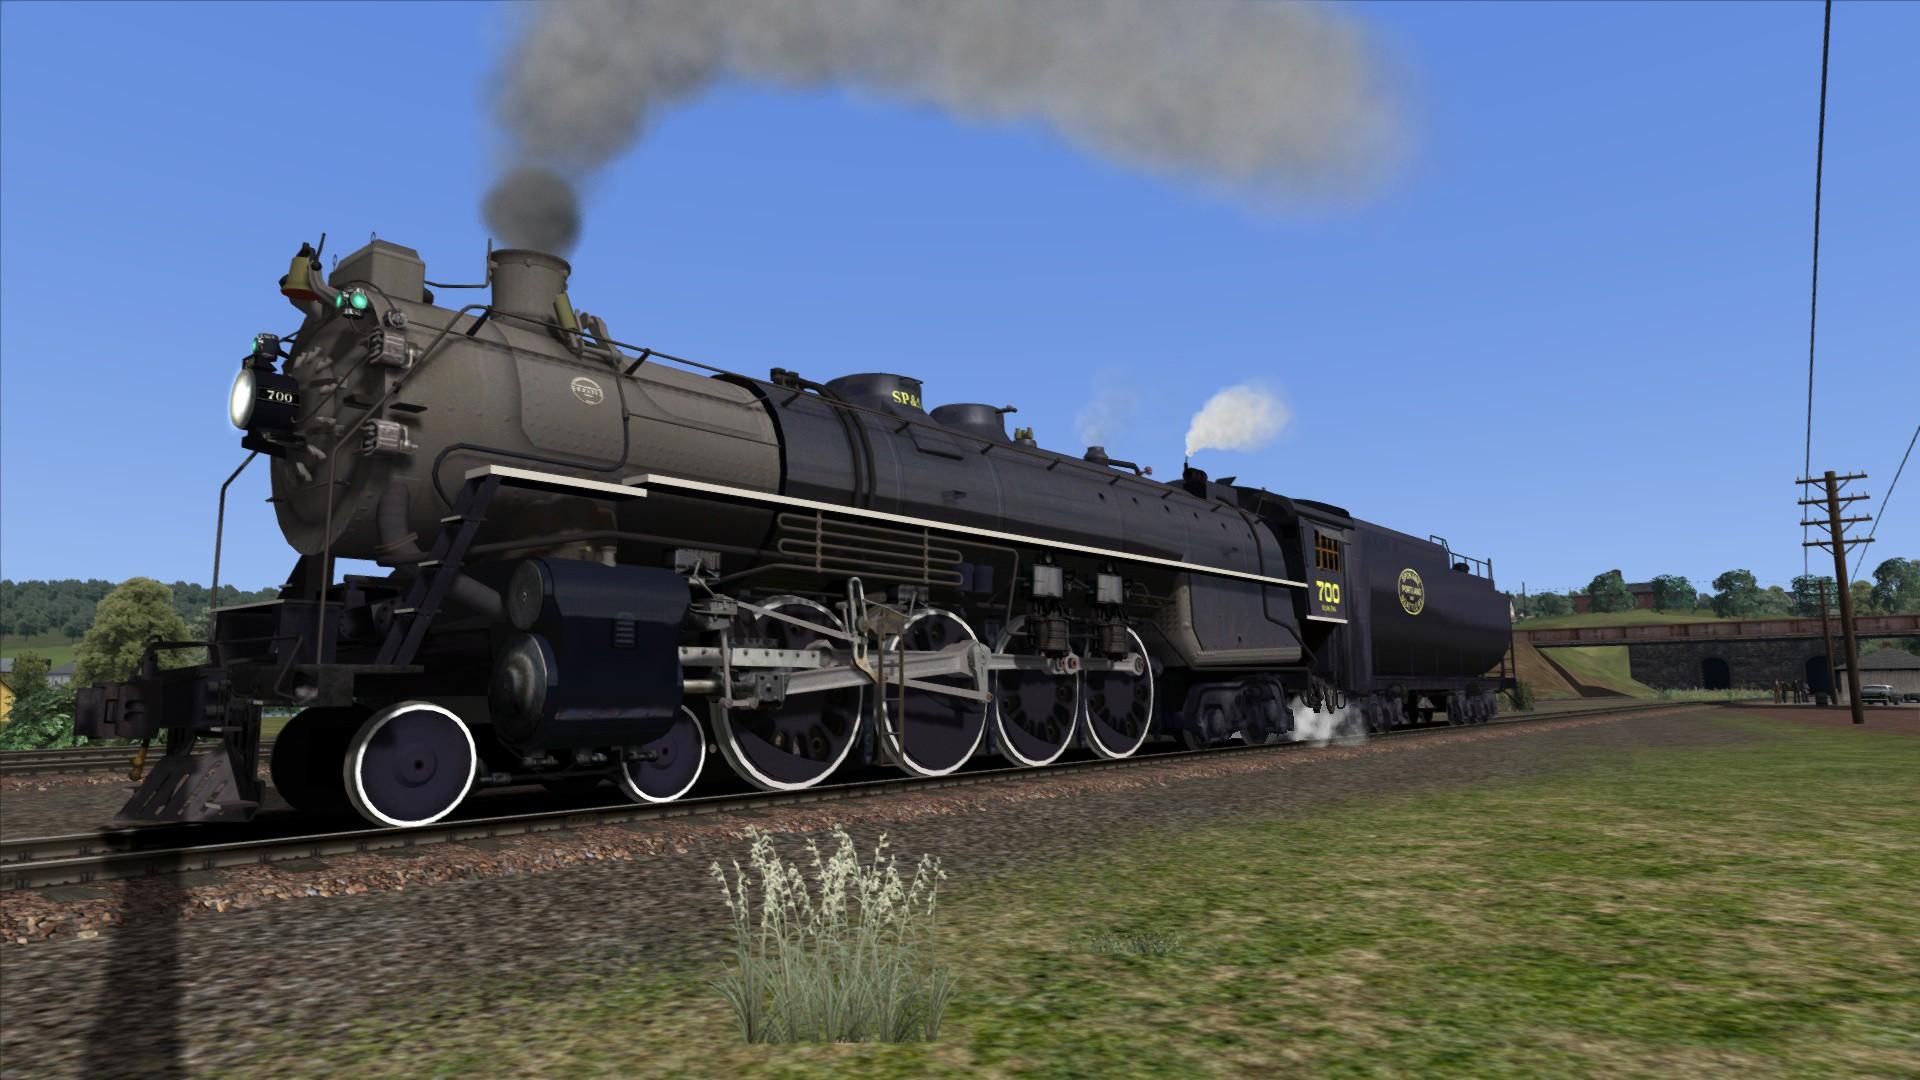 Train Simulator: SP&S E-1 Class 'Northern' Loco Add-On screenshot